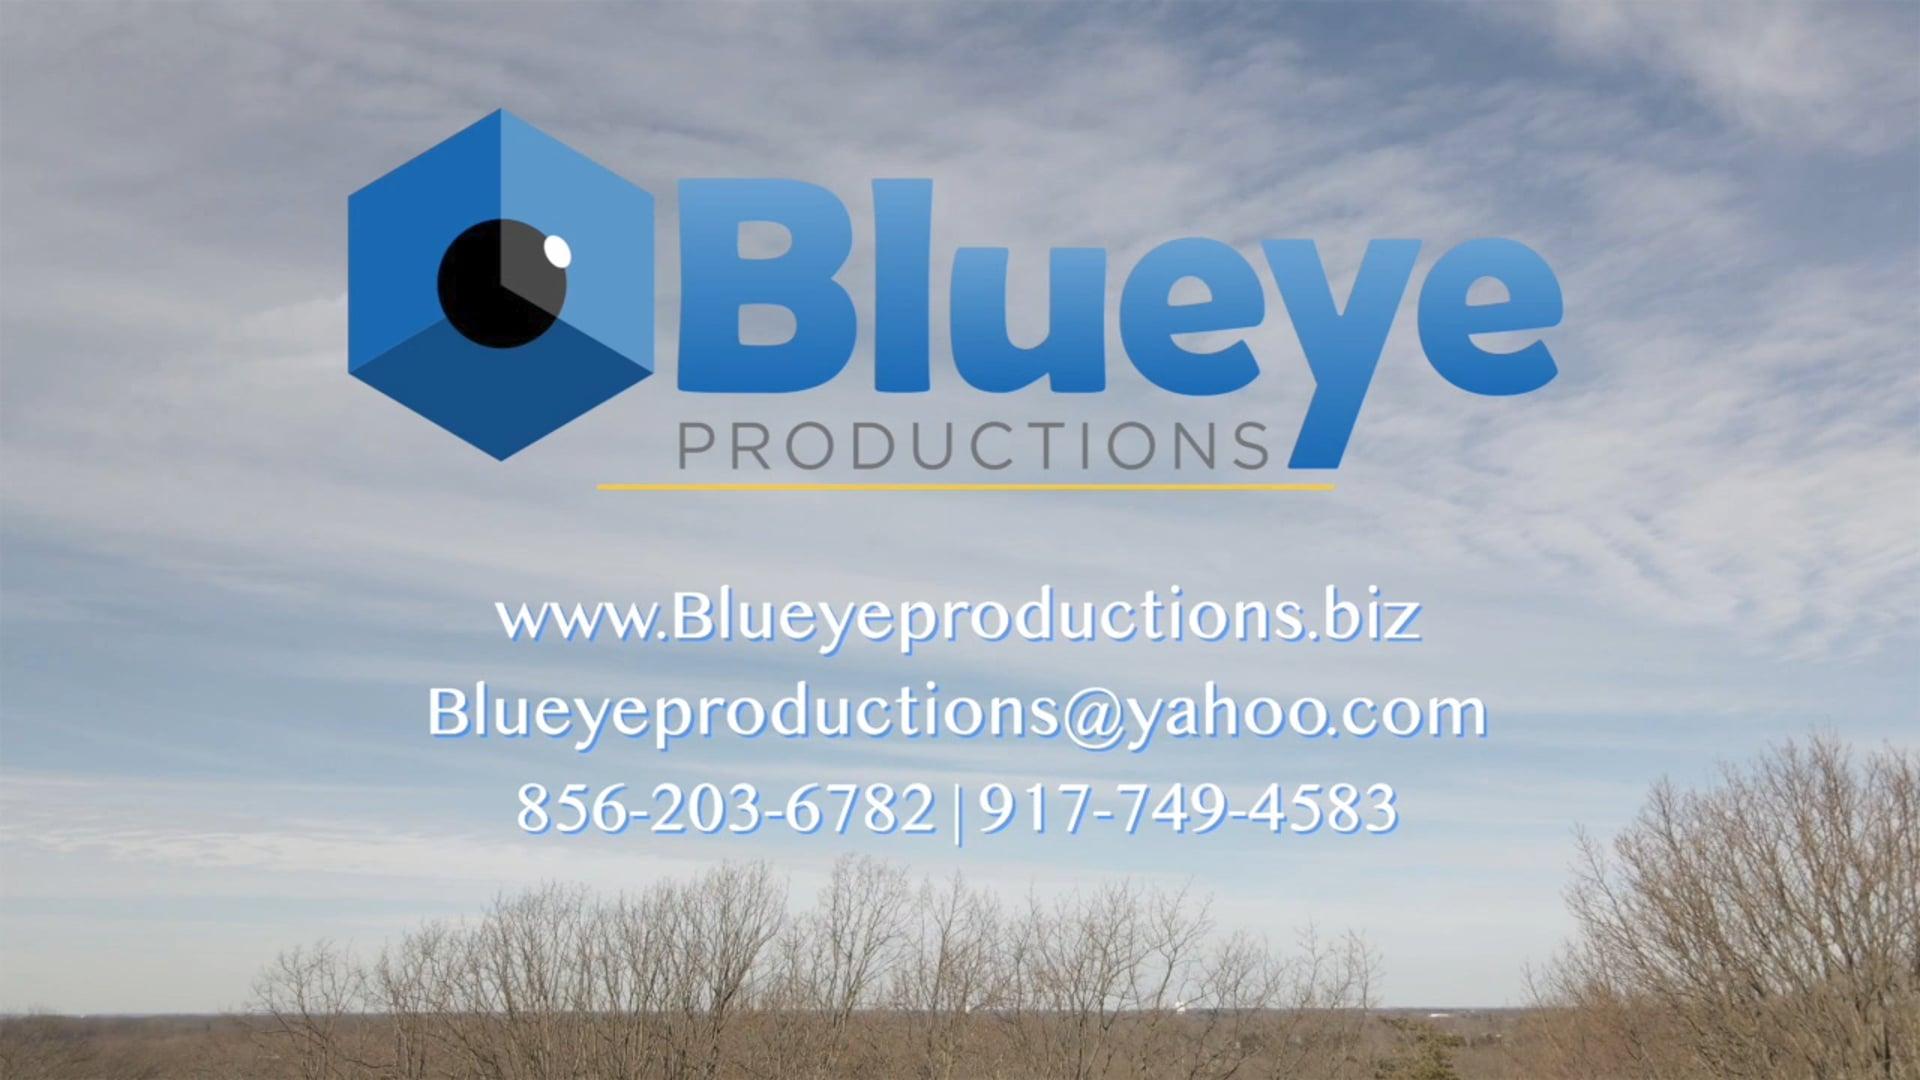 Blueye's Drone